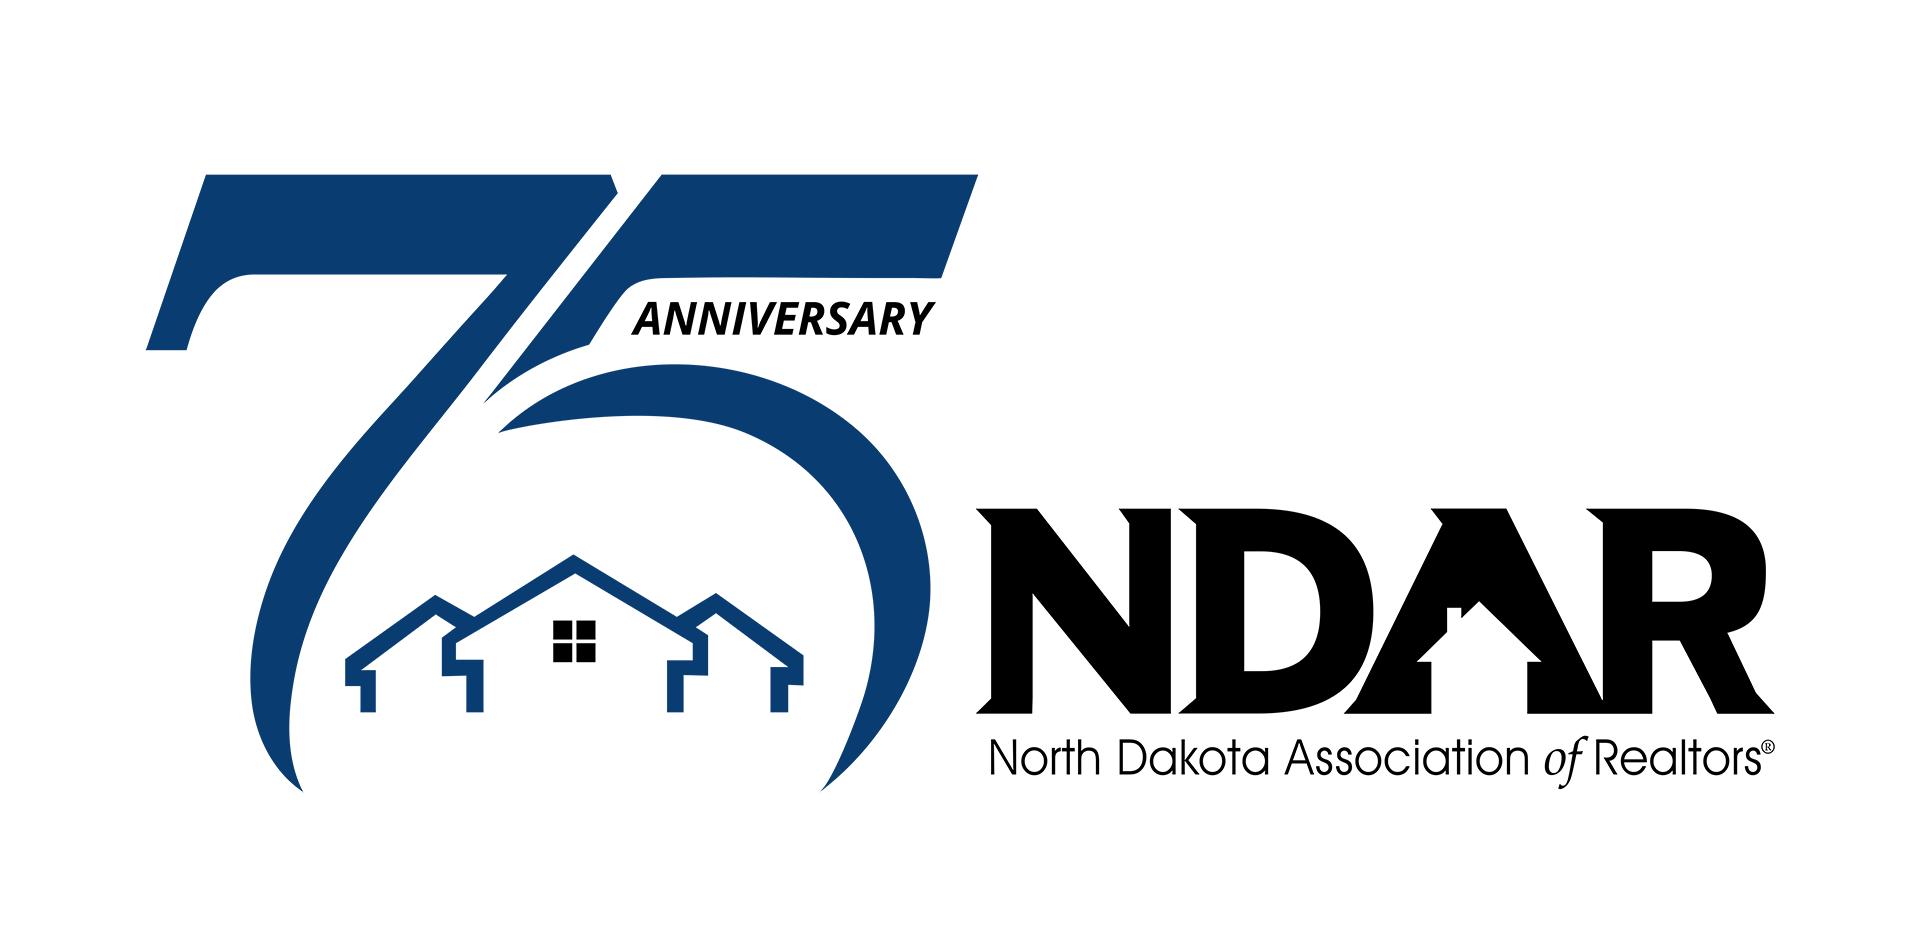 75th Anniversary: NDAR